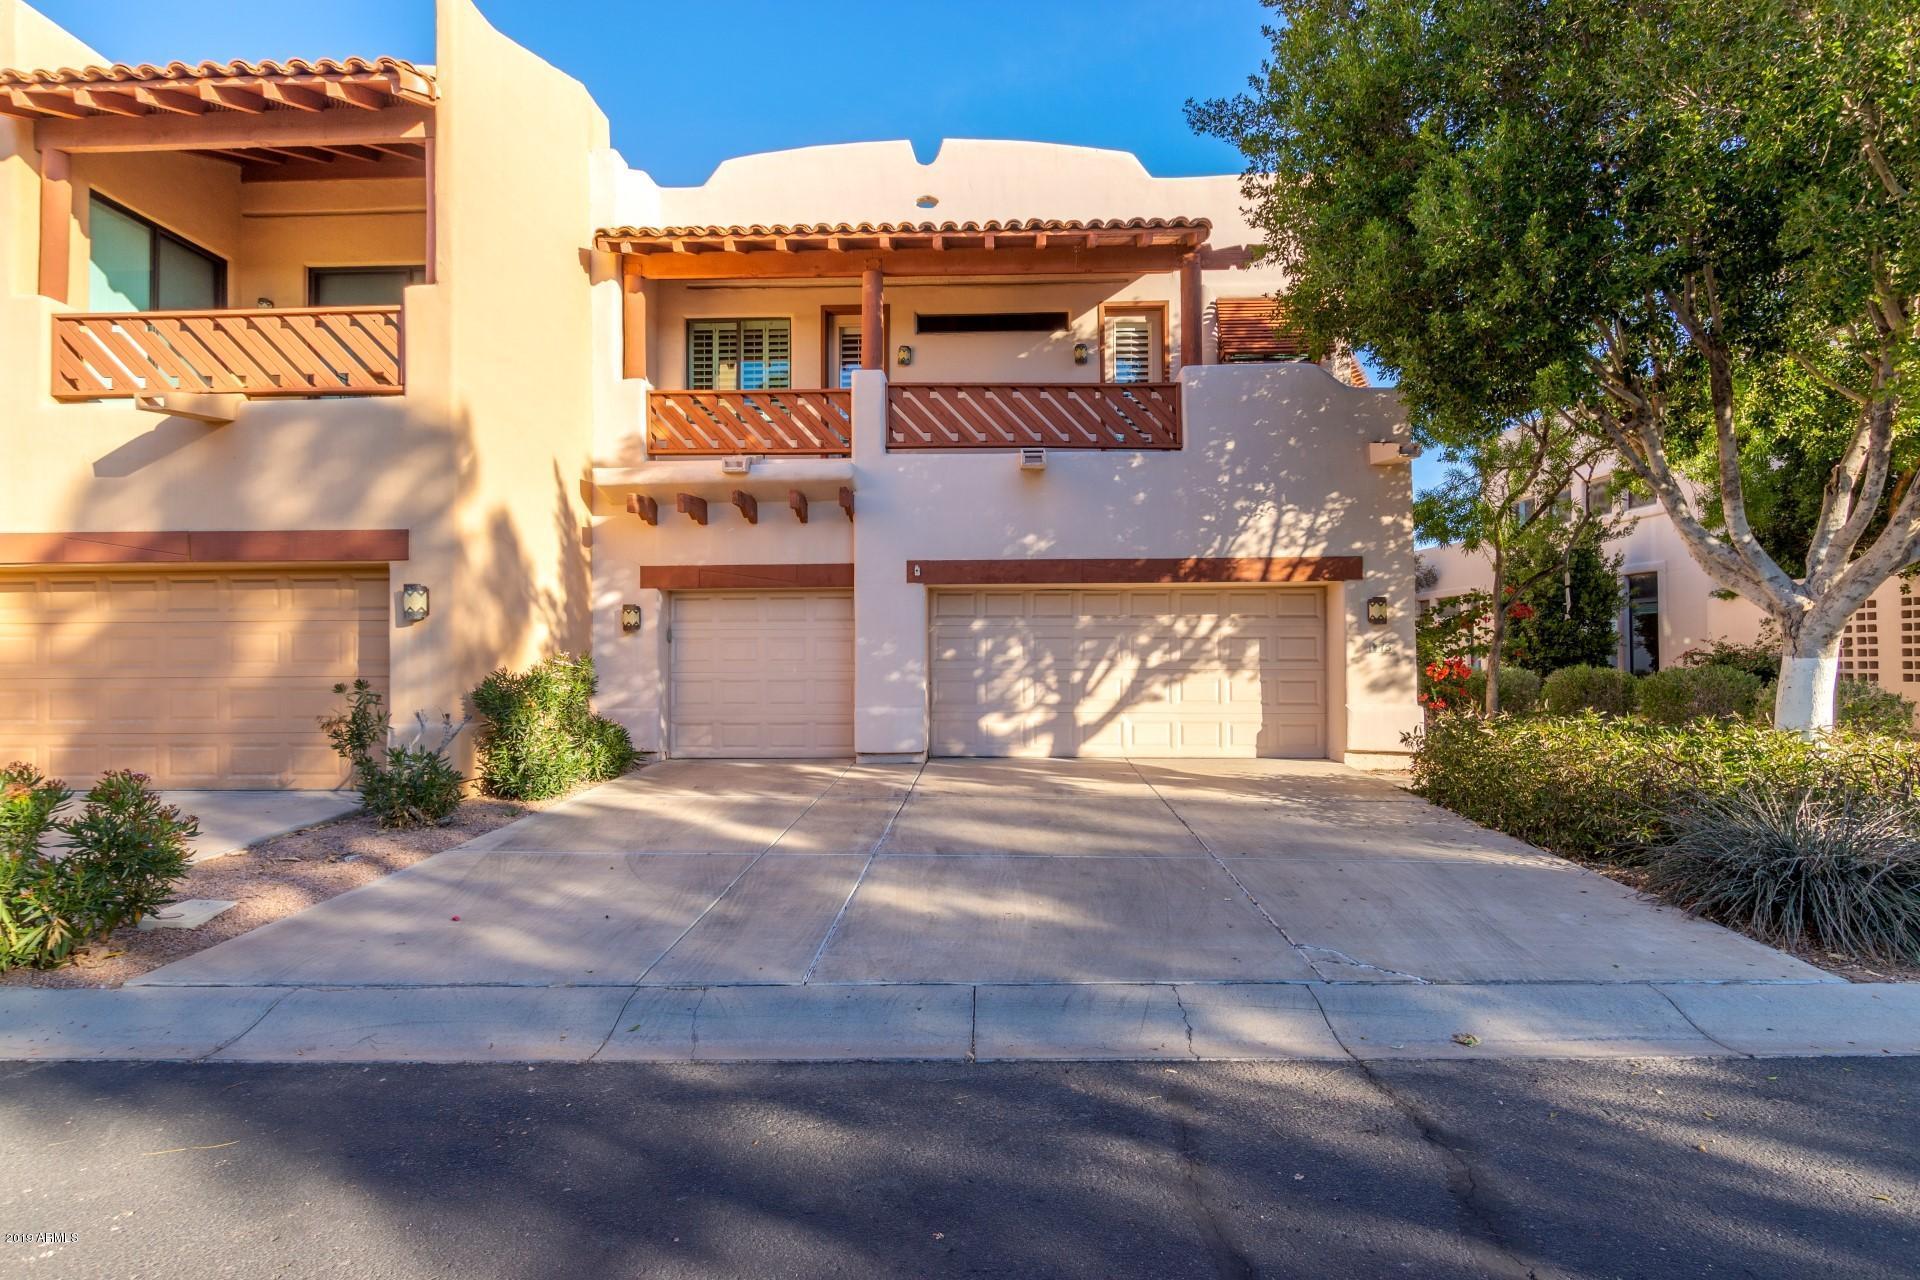 Photo of 333 N PENNINGTON Drive #15, Chandler, AZ 85224